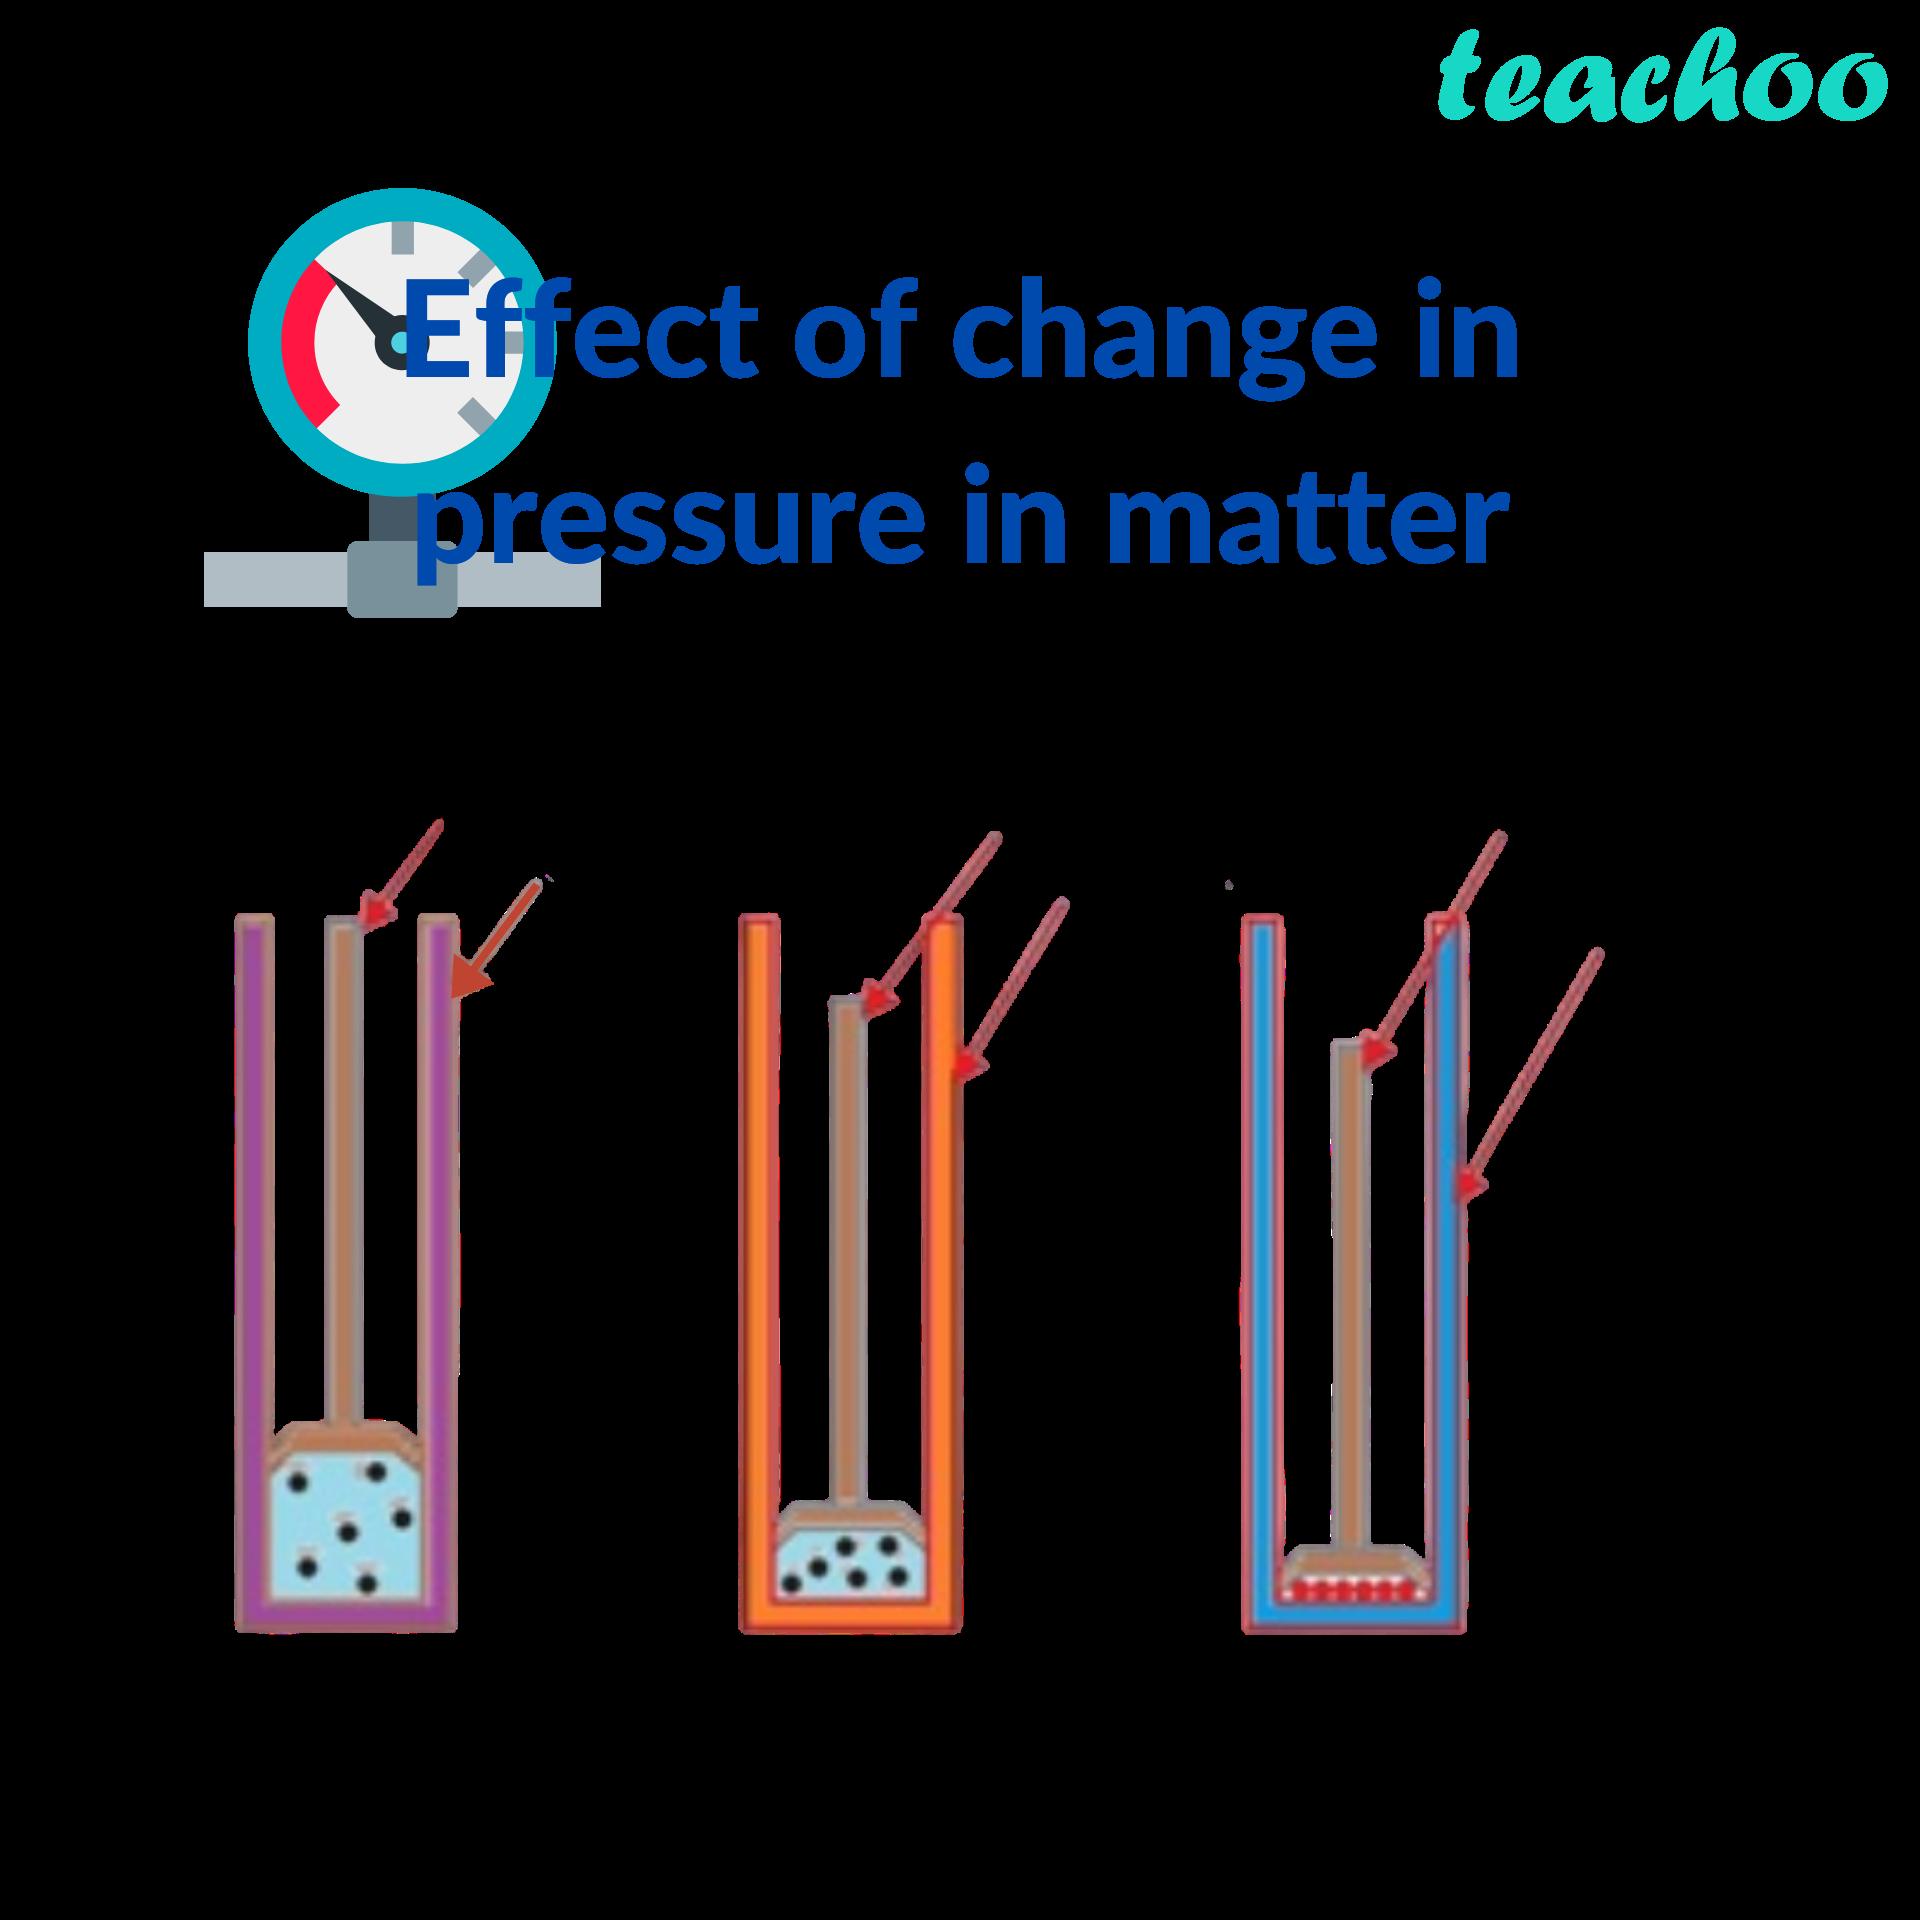 Effect of change in pressure in matter - Teachoo.png